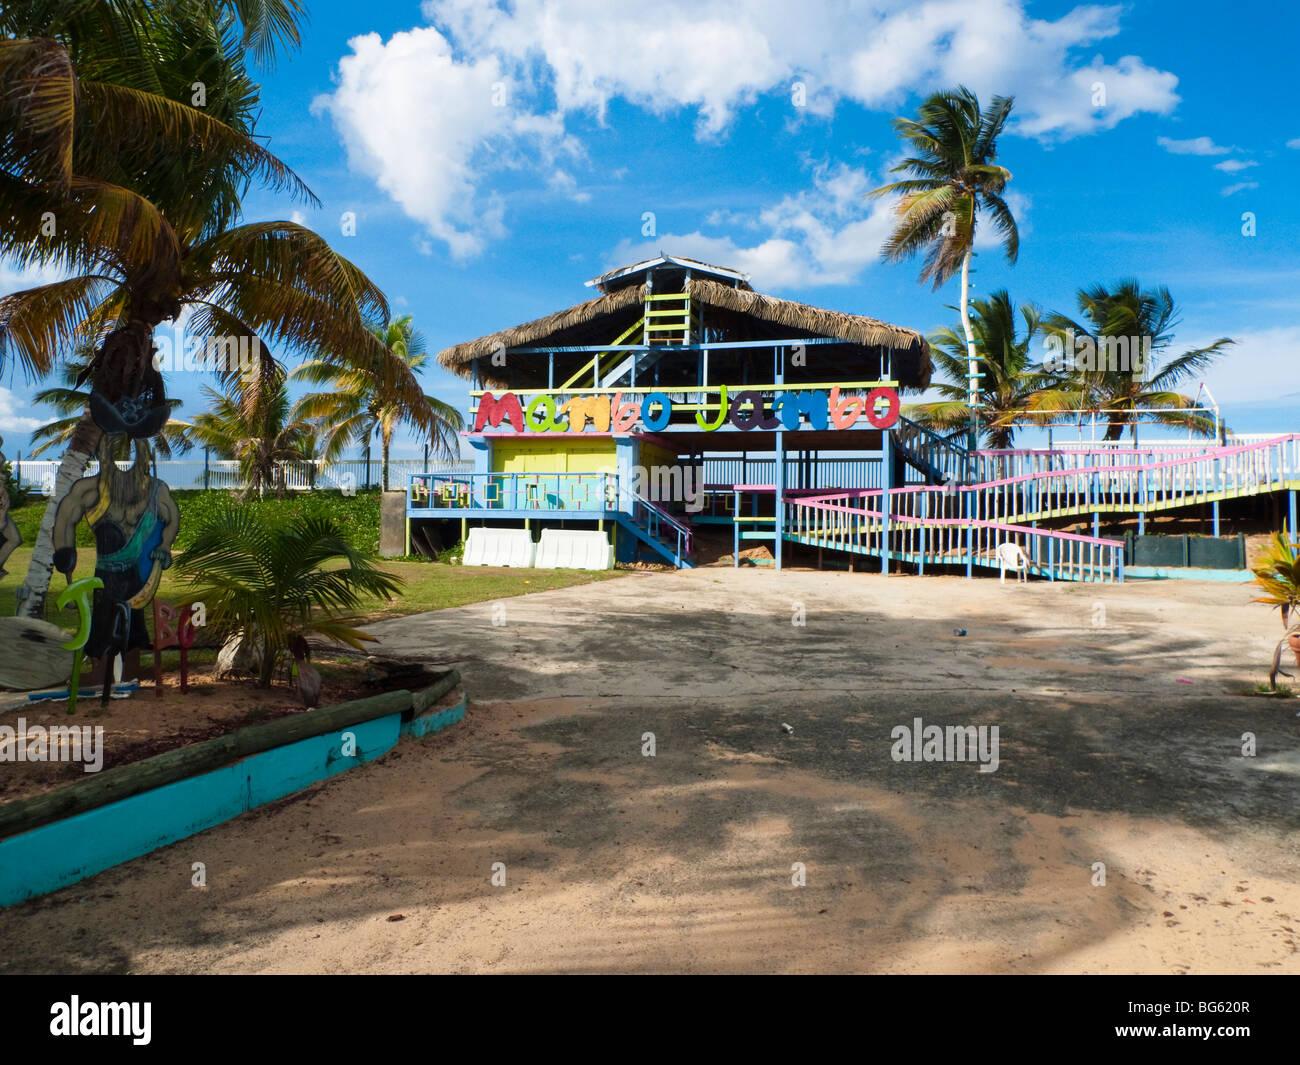 Local Beach Club in Pinones, Puerto Rico - Stock Image